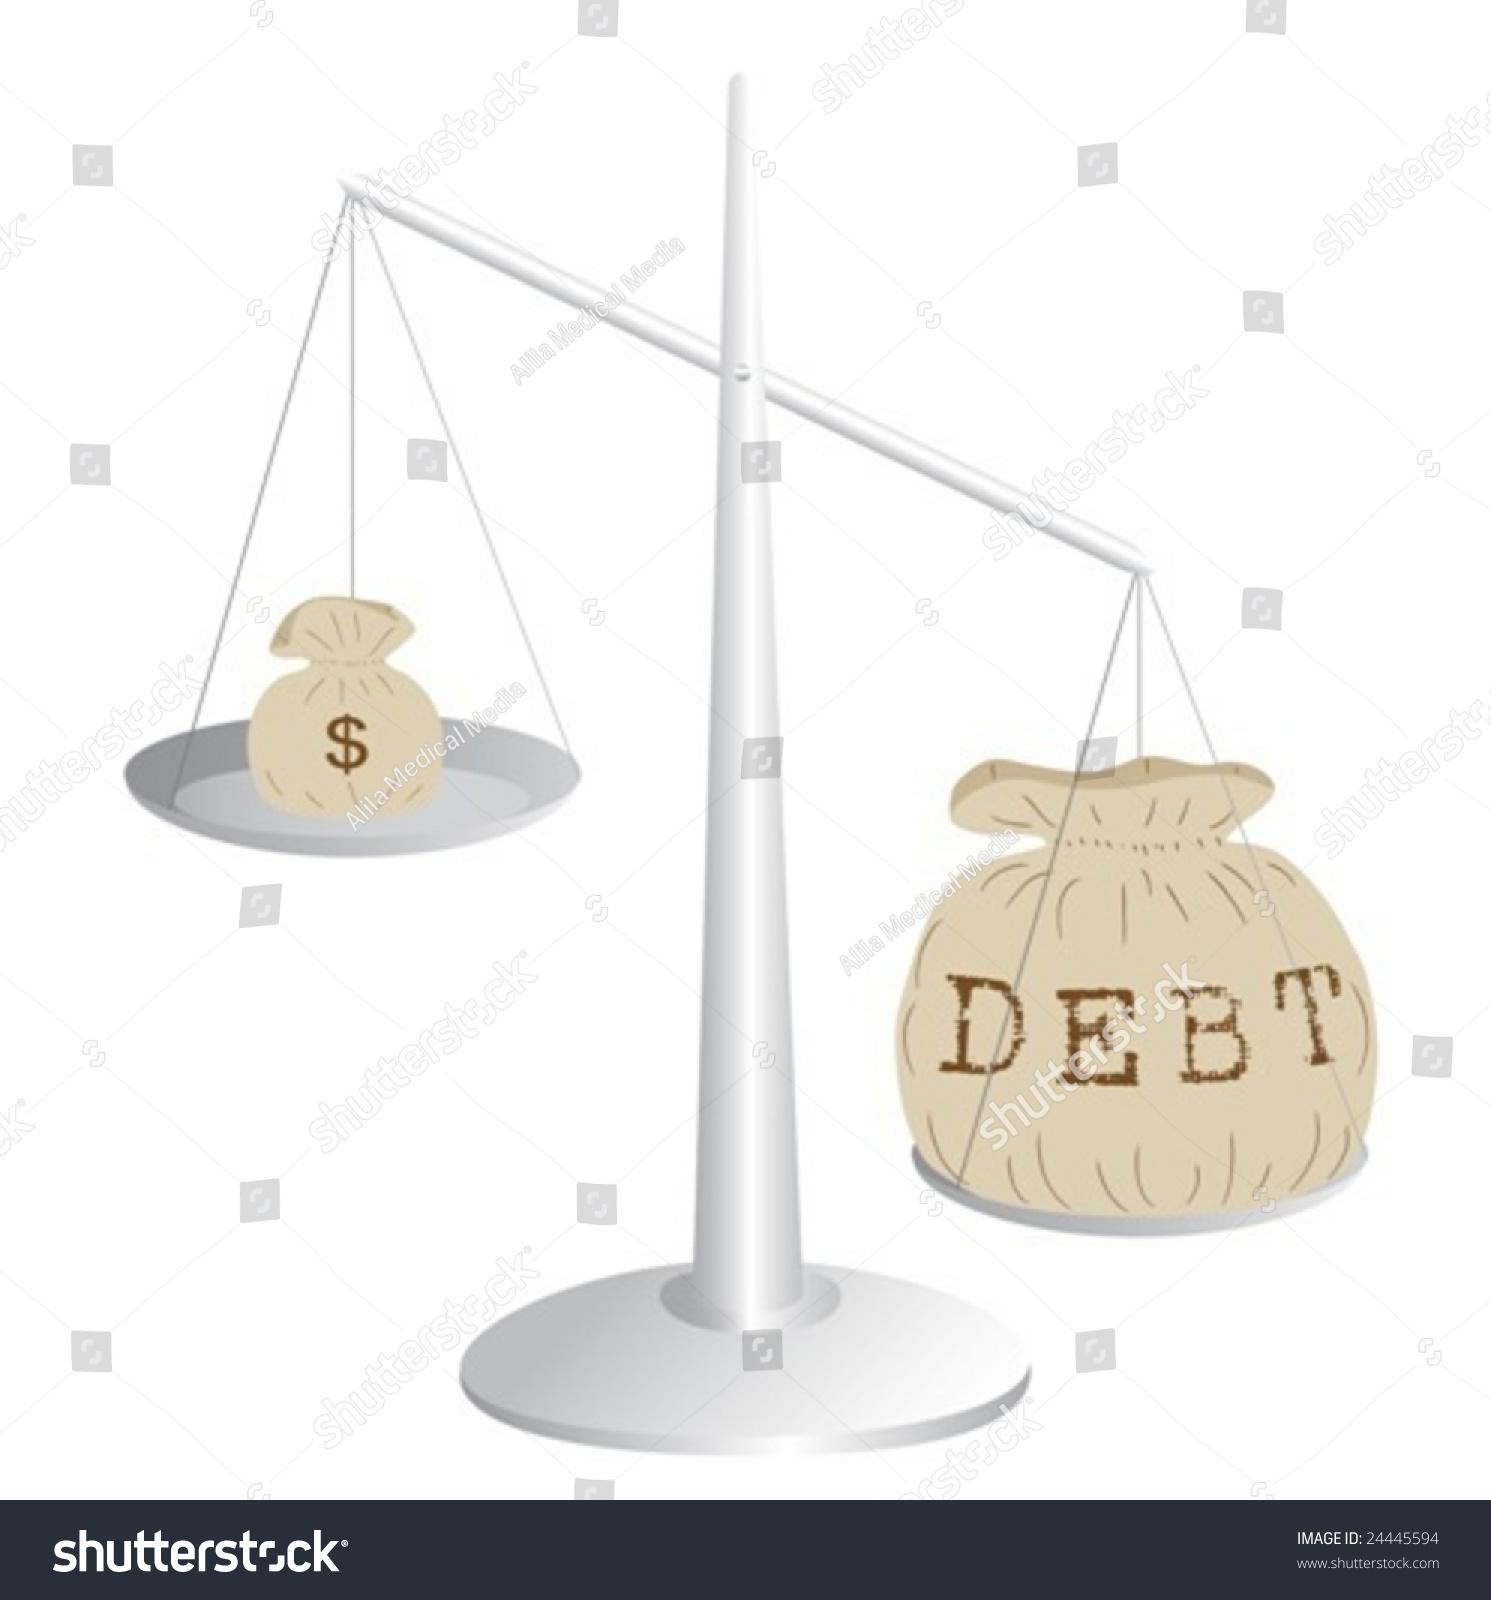 Budget deficit?